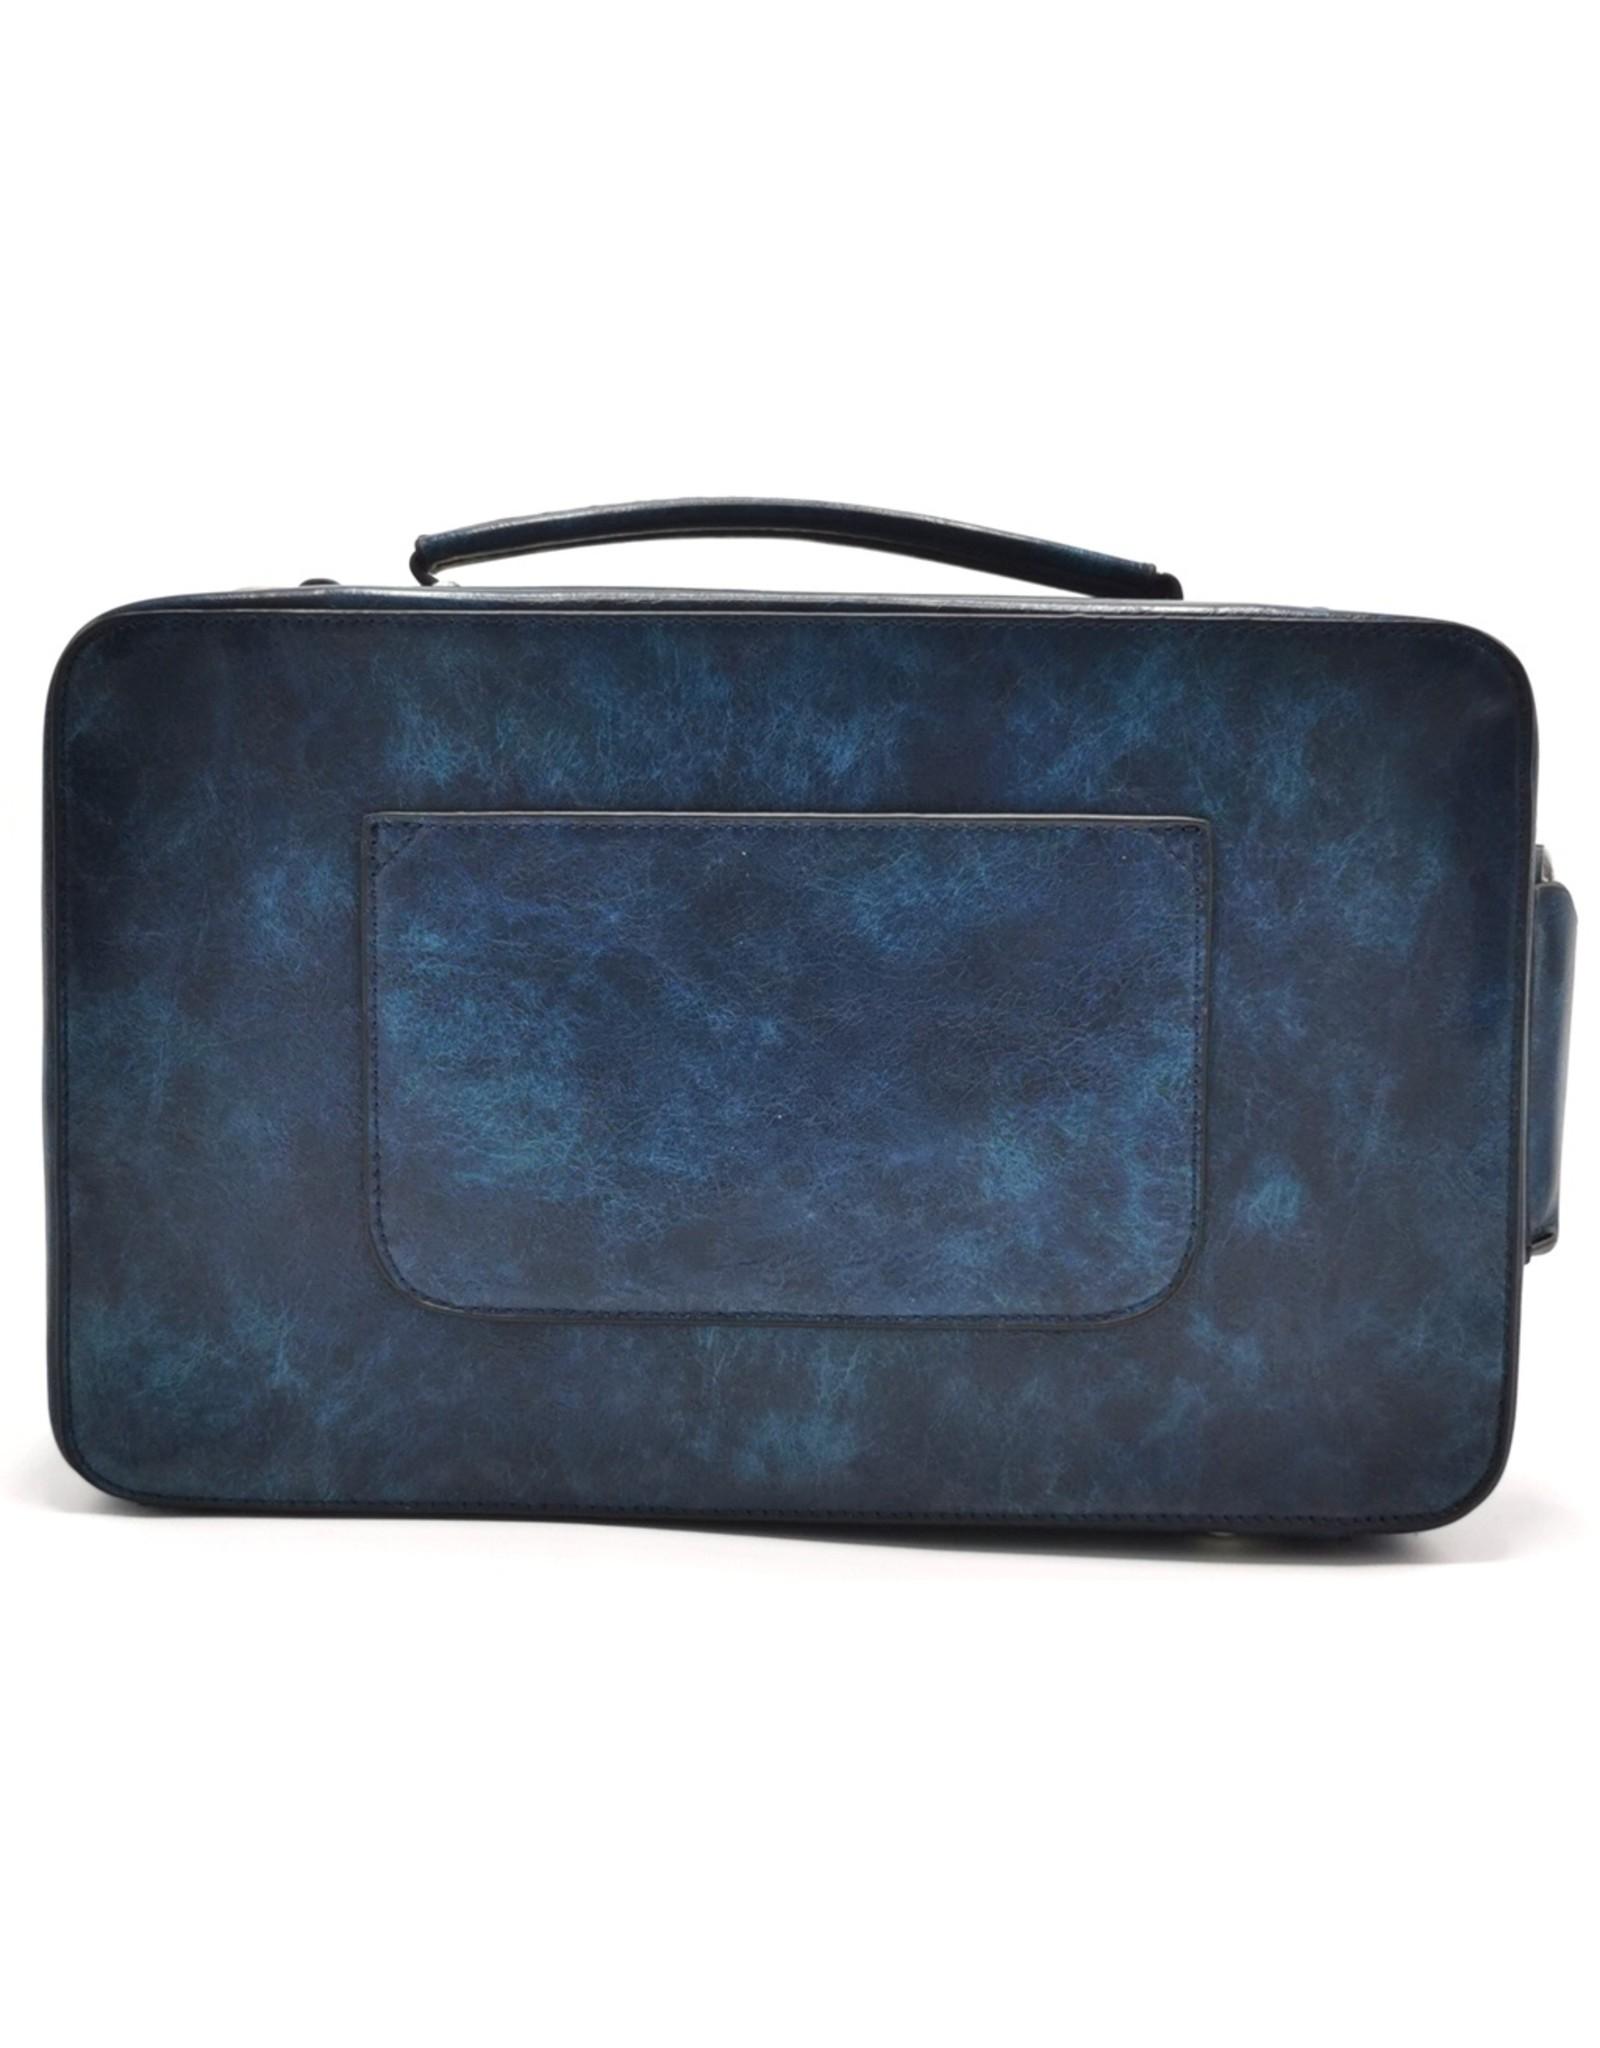 Eliox Fantasy tassen en portemonnees - Boombox Retro Radio Handtas met Echte Radio blauw